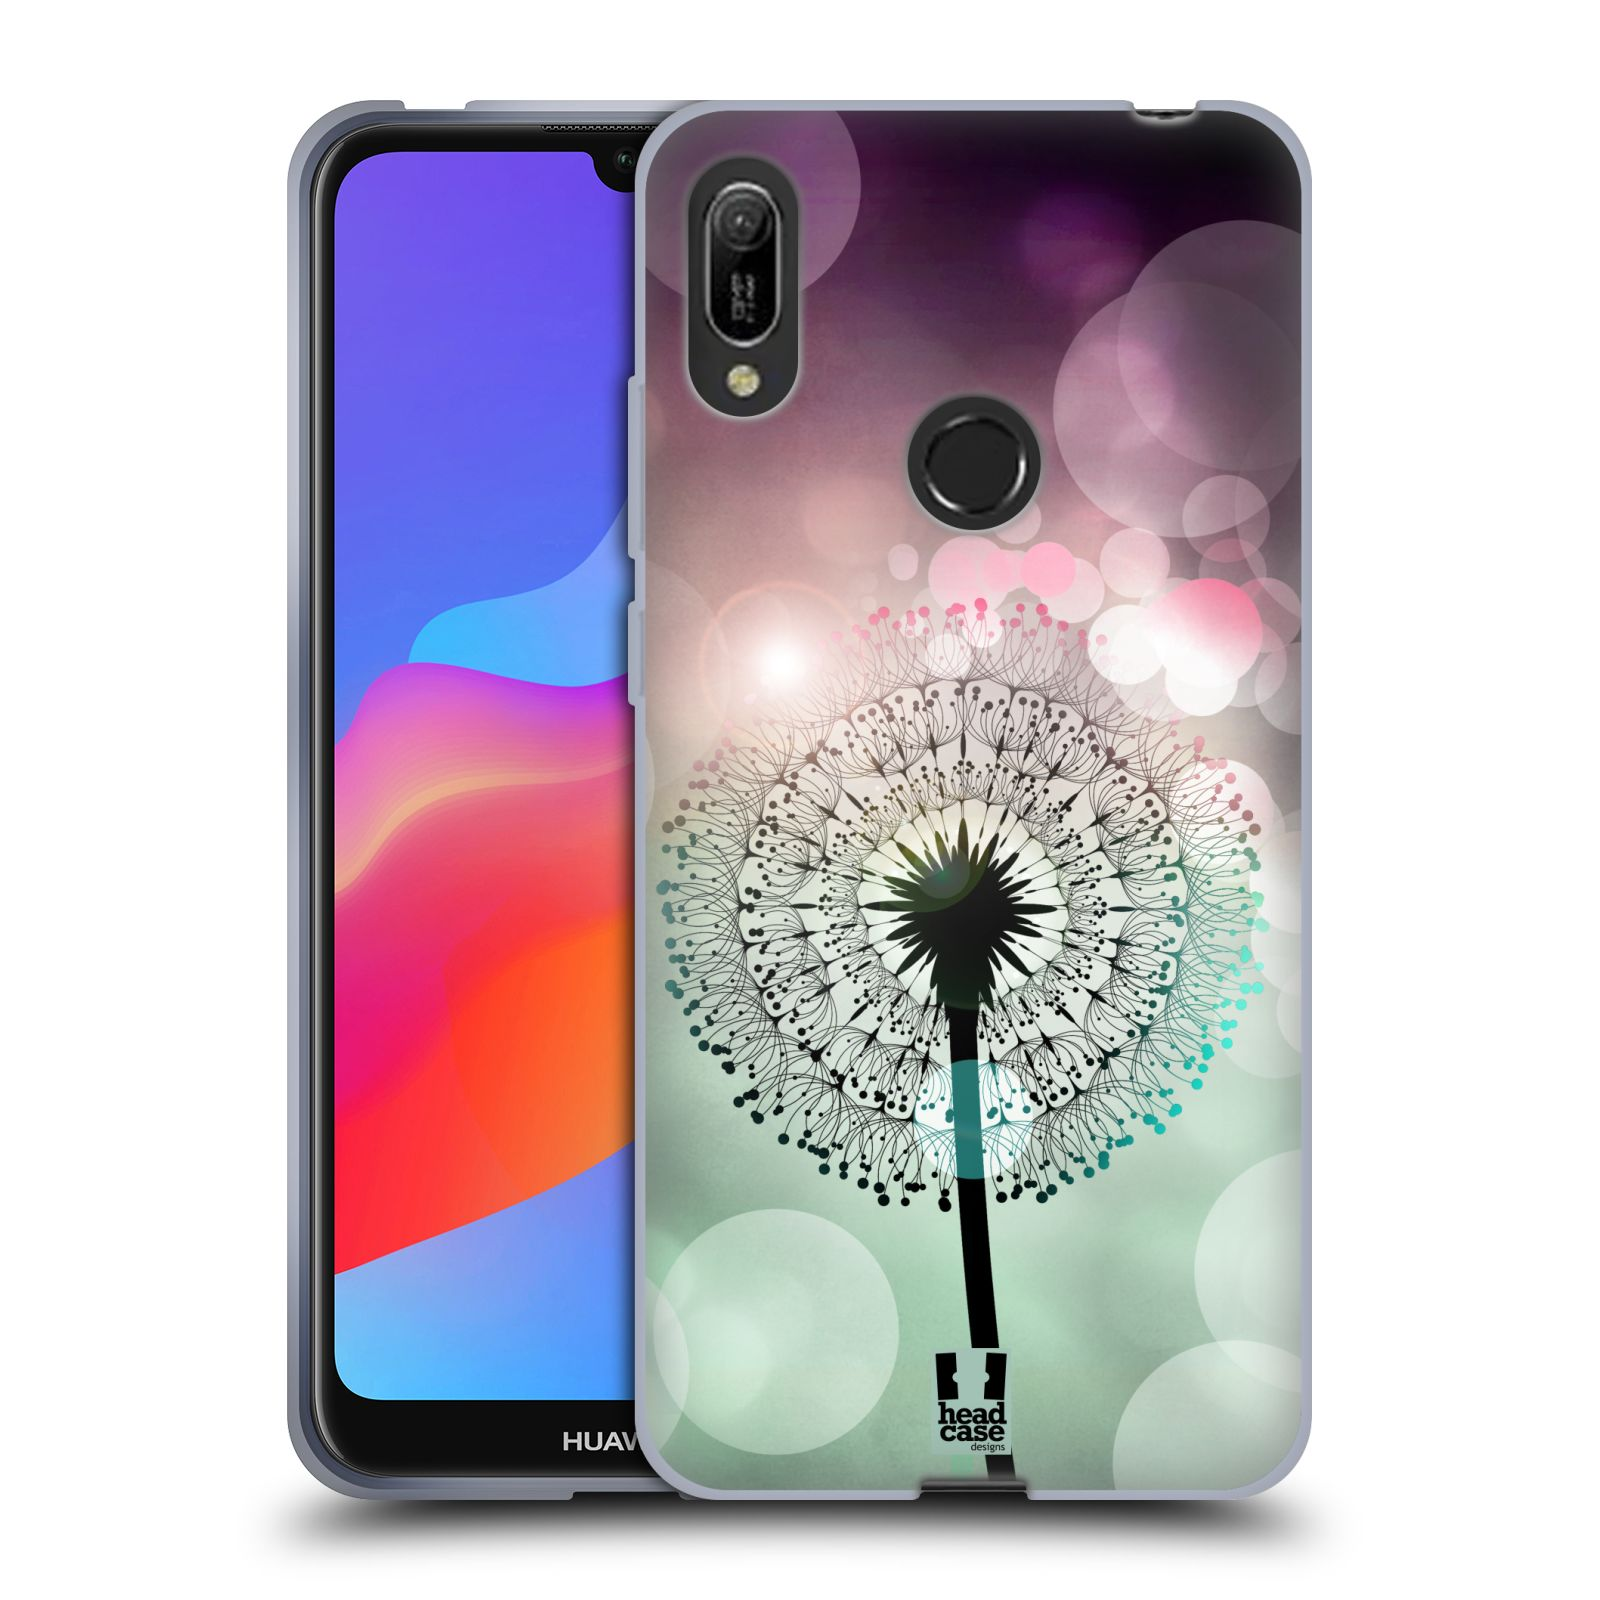 Silikonové pouzdro na mobil Huawei Y6 (2019) - Head Case - Pampeliškové odlesky